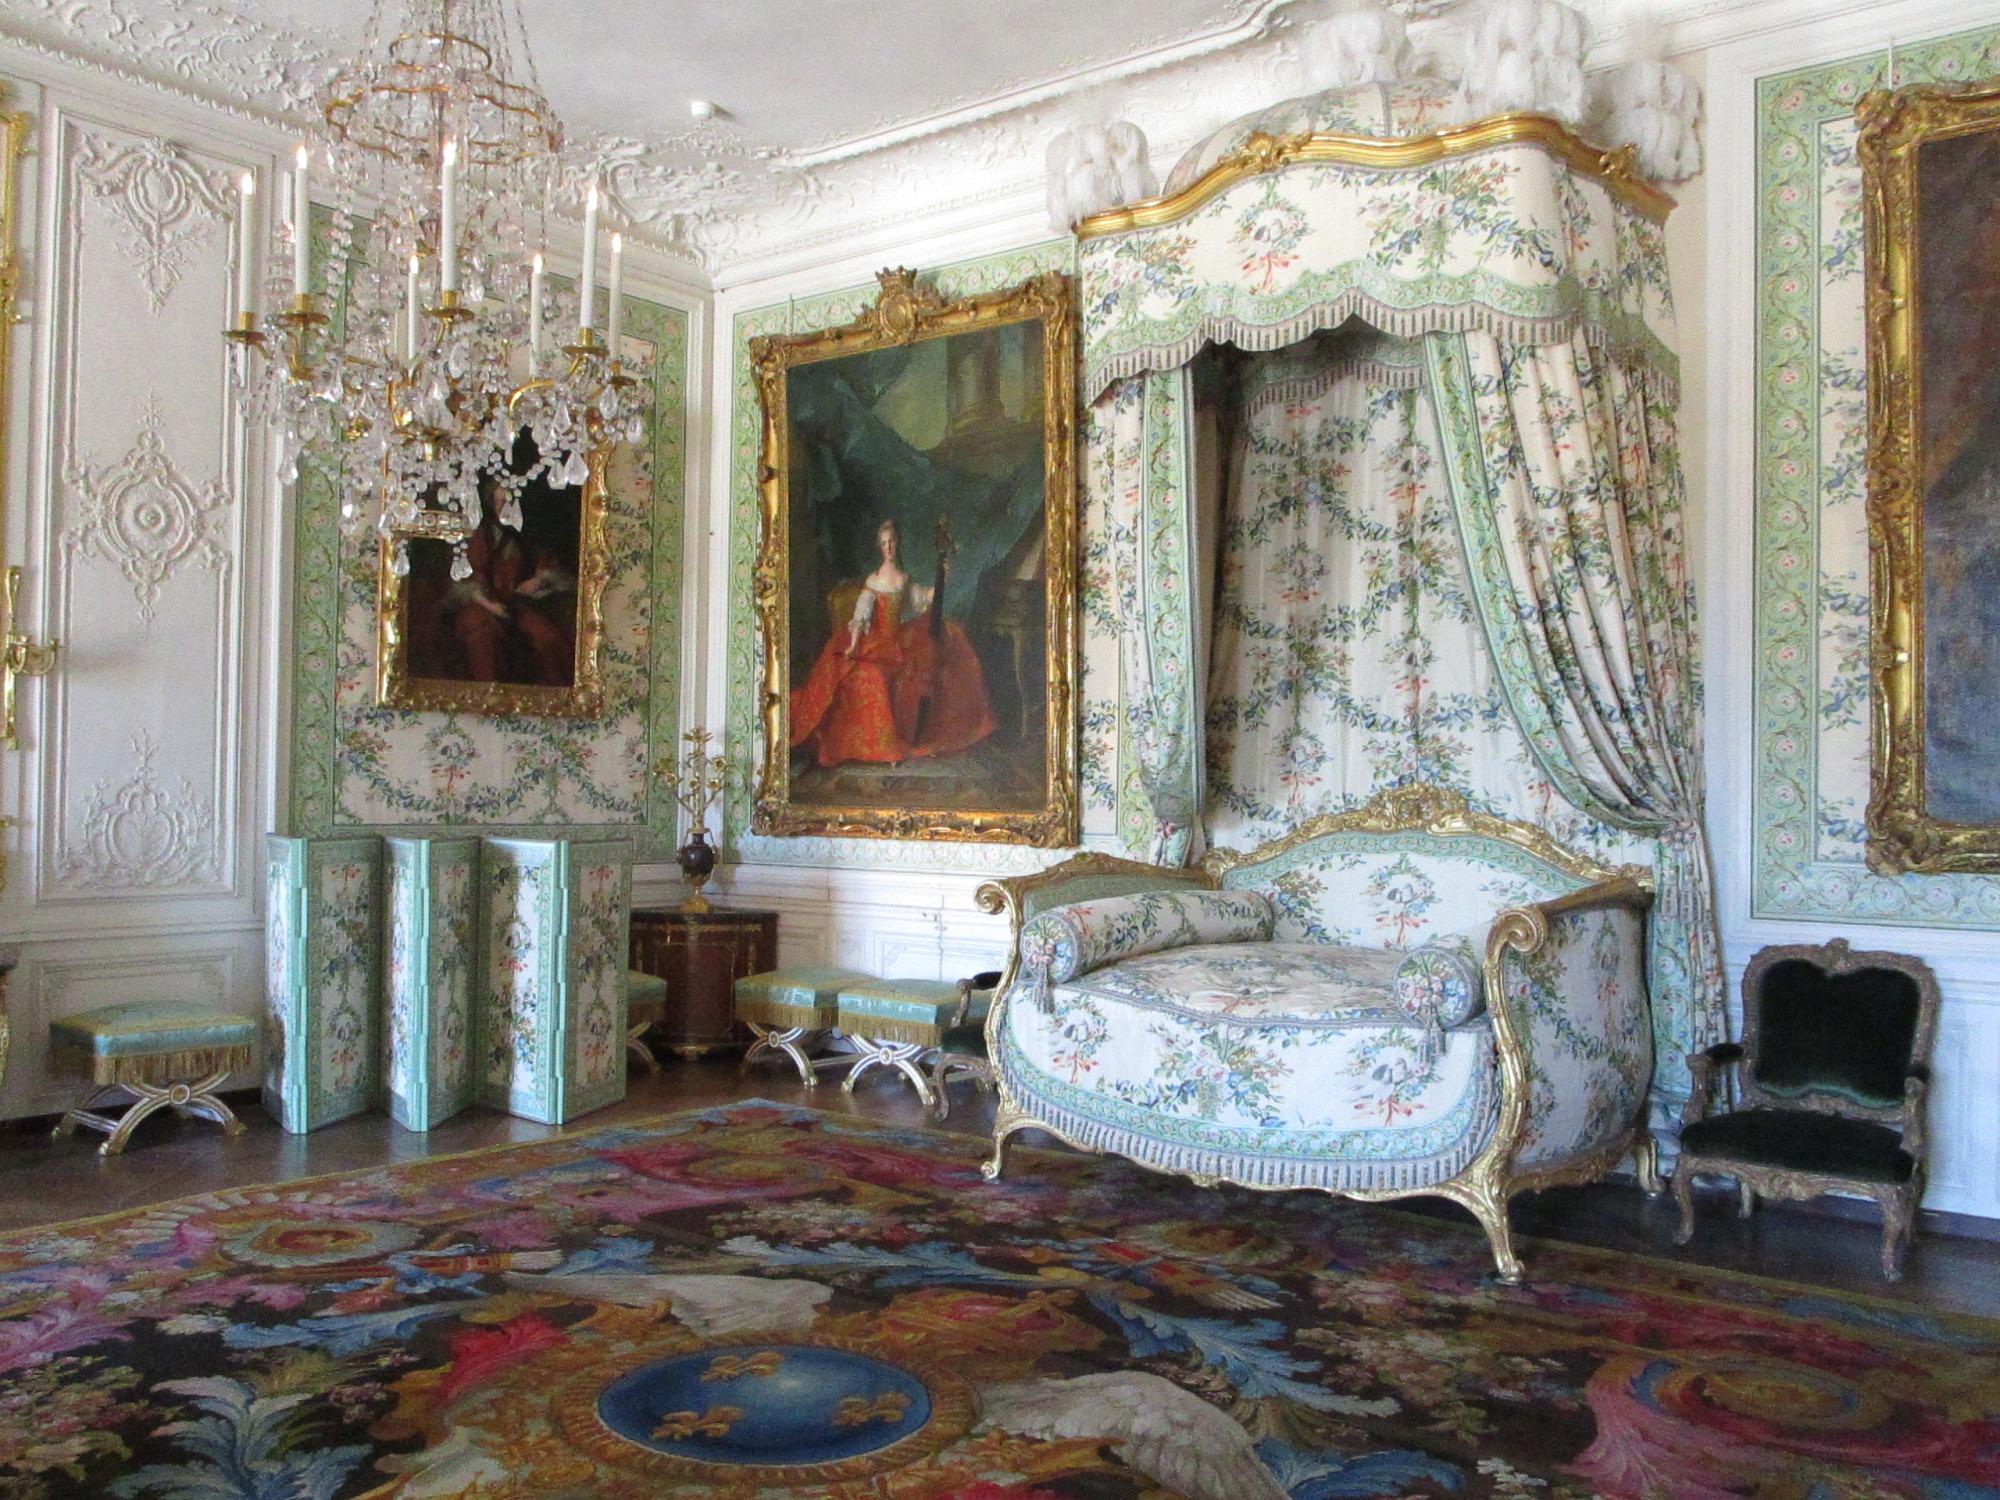 Bedchamber of Madame Voctoire, Versailles